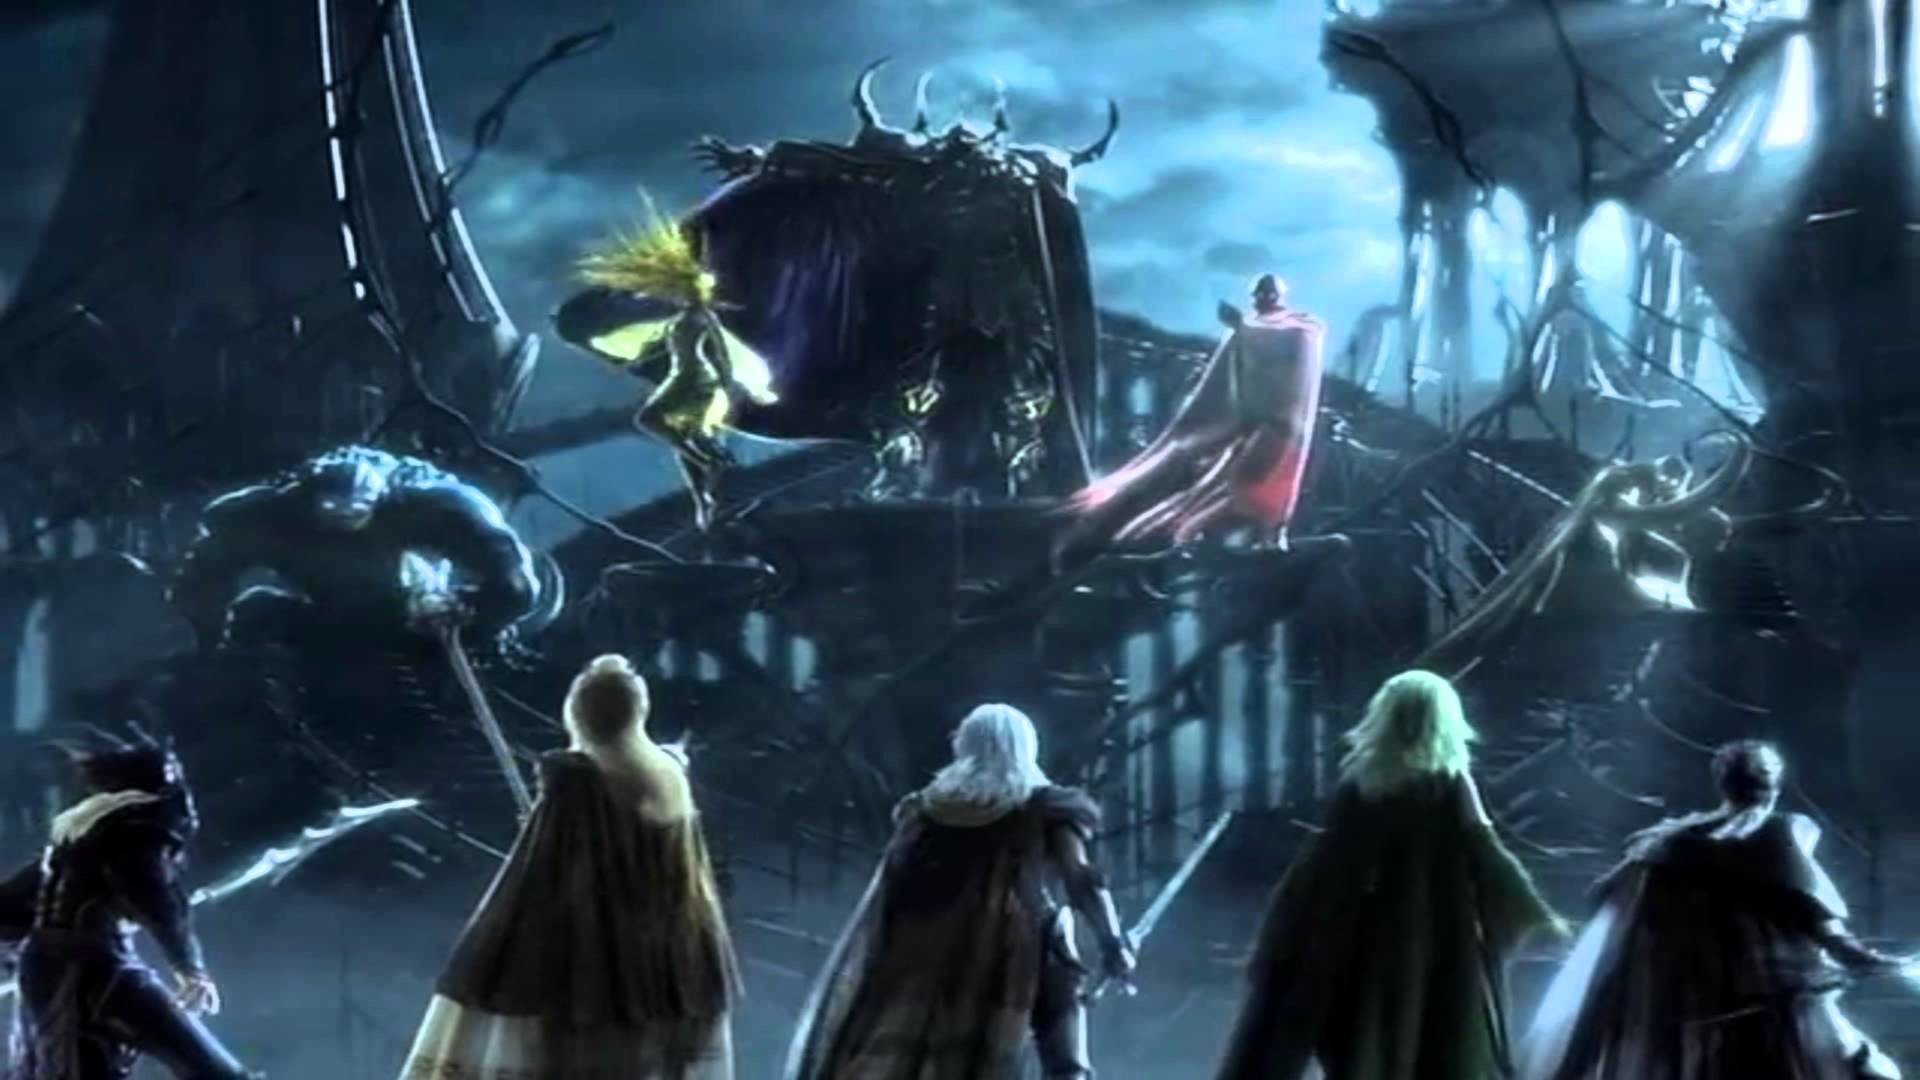 CdV 373: Final Fantasy IV – Battle With The Four Fiends (Versión DS)